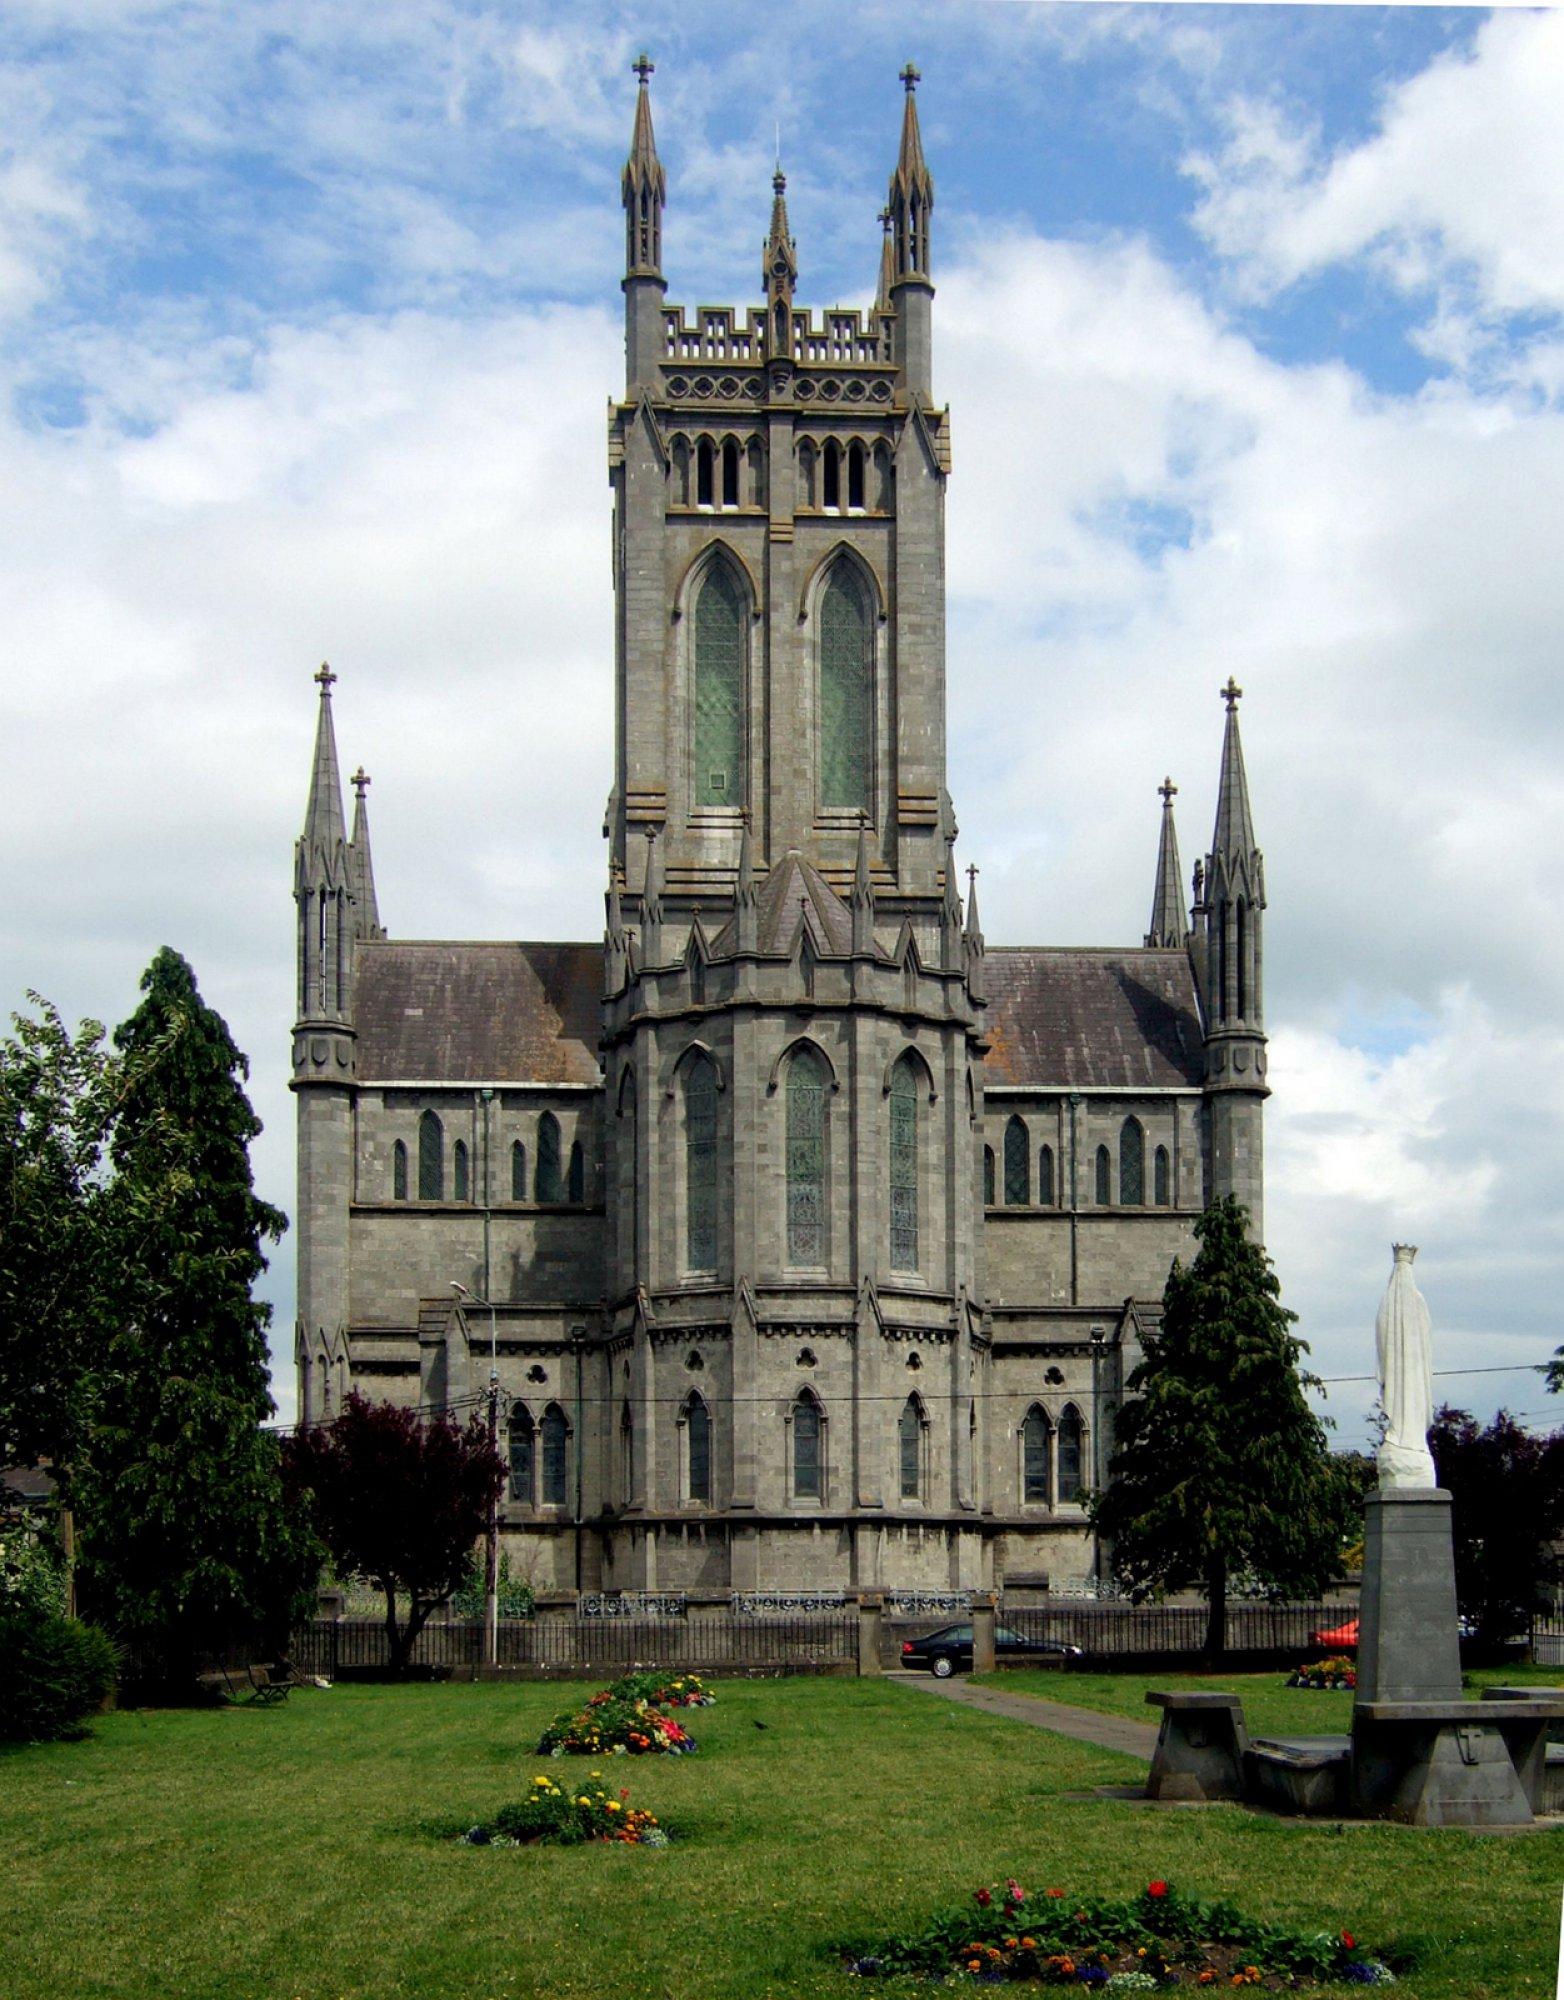 https://bubo.sk/uploads/galleries/5047/church-in-kilkenny.jpg